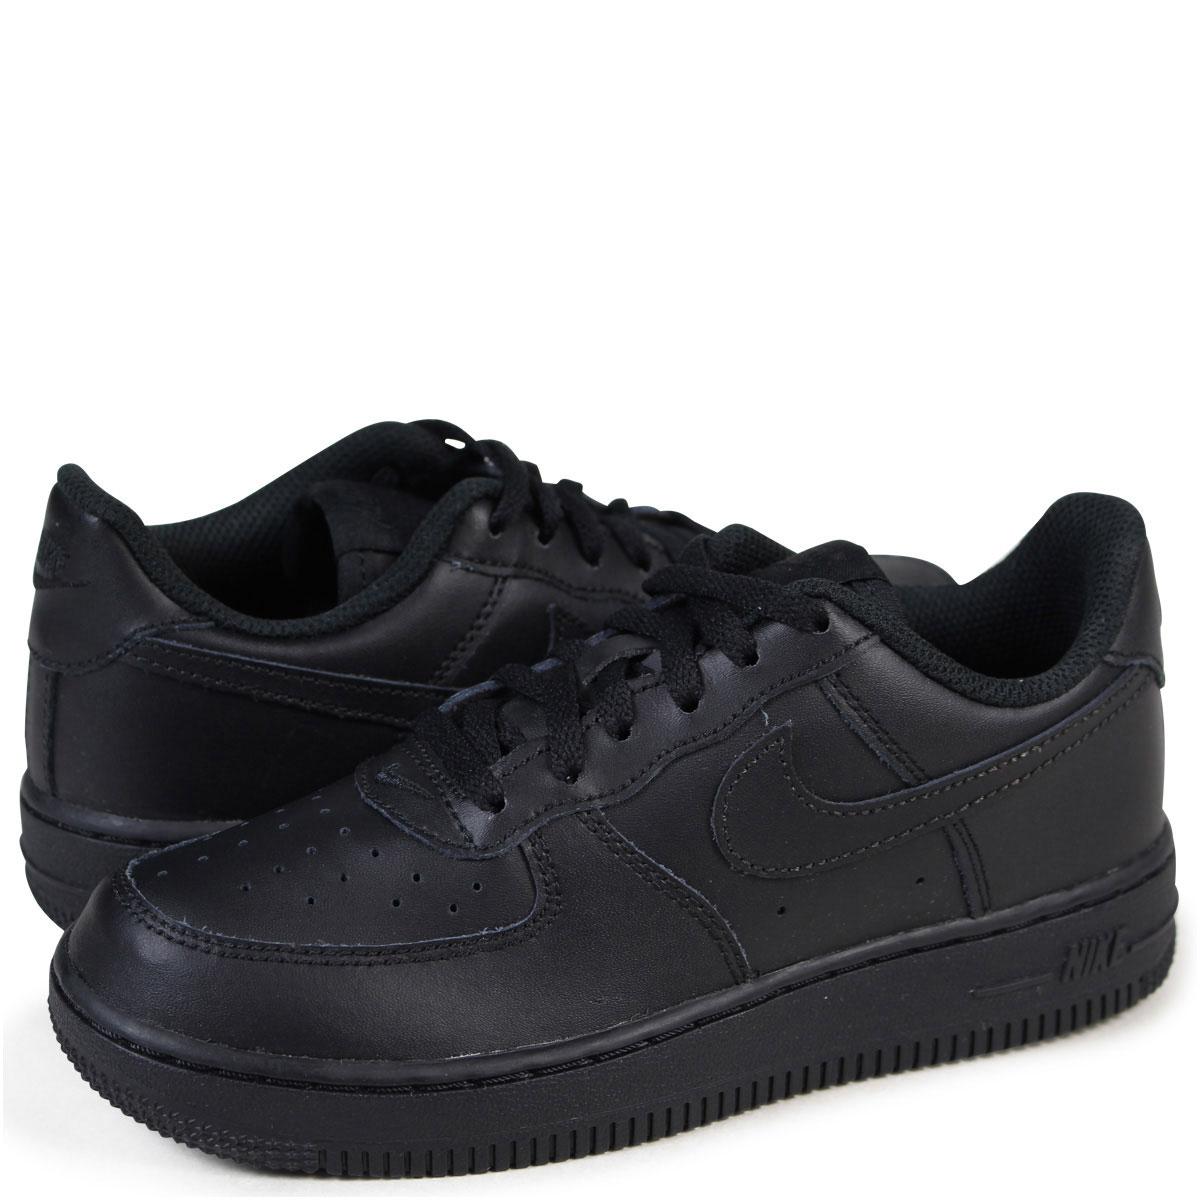 Low Black Air 009 Sneakers 314 193 Force Kids Nike 1 Ps RcLq5A34j